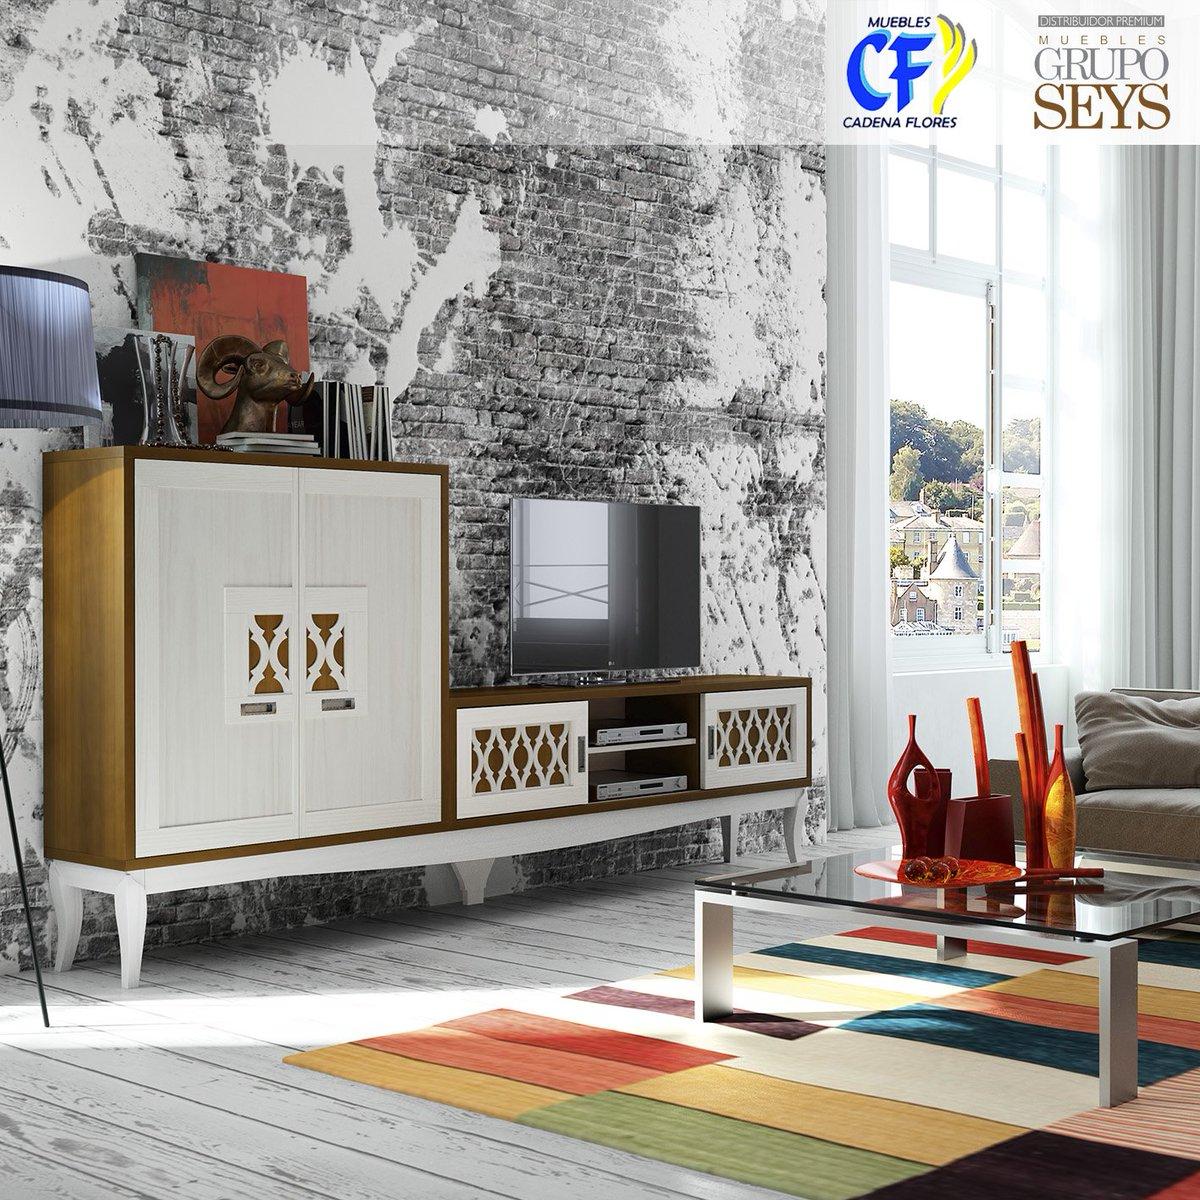 Muebles Cadena Flores - Muebles Grupo Seys On Twitter Felizlunes Comedor Basilea Y [mjhdah]https://pbs.twimg.com/media/DFfUbagXcAA1Fm2.jpg